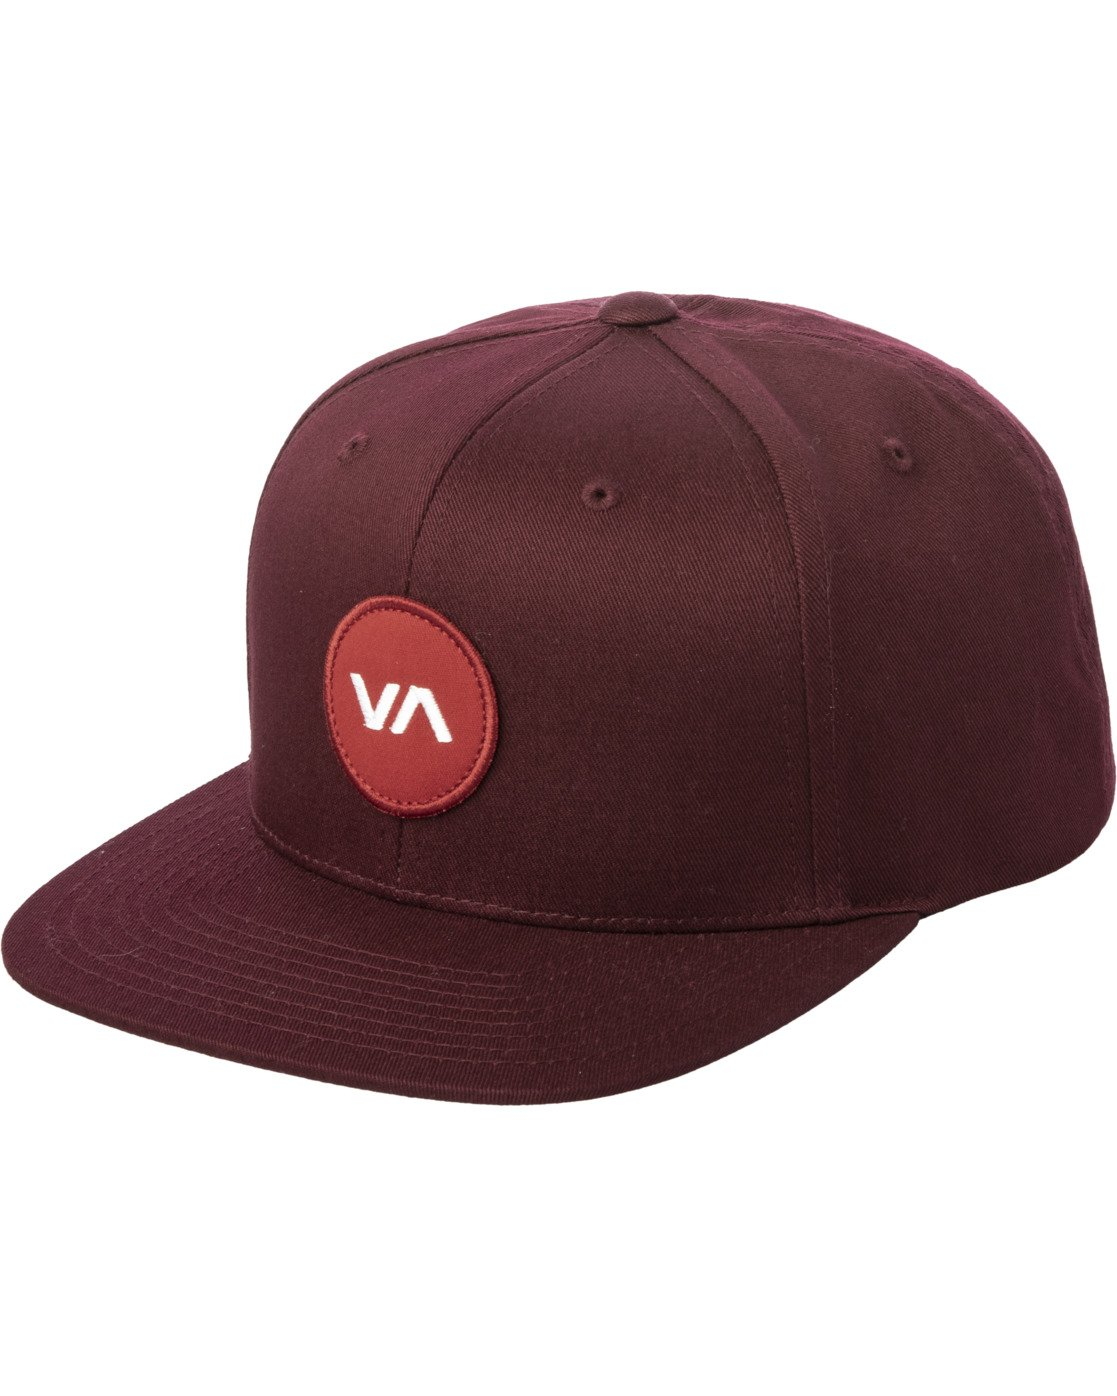 0 VA PATCH SNAPBACK HAT Purple MAHWVRVP RVCA